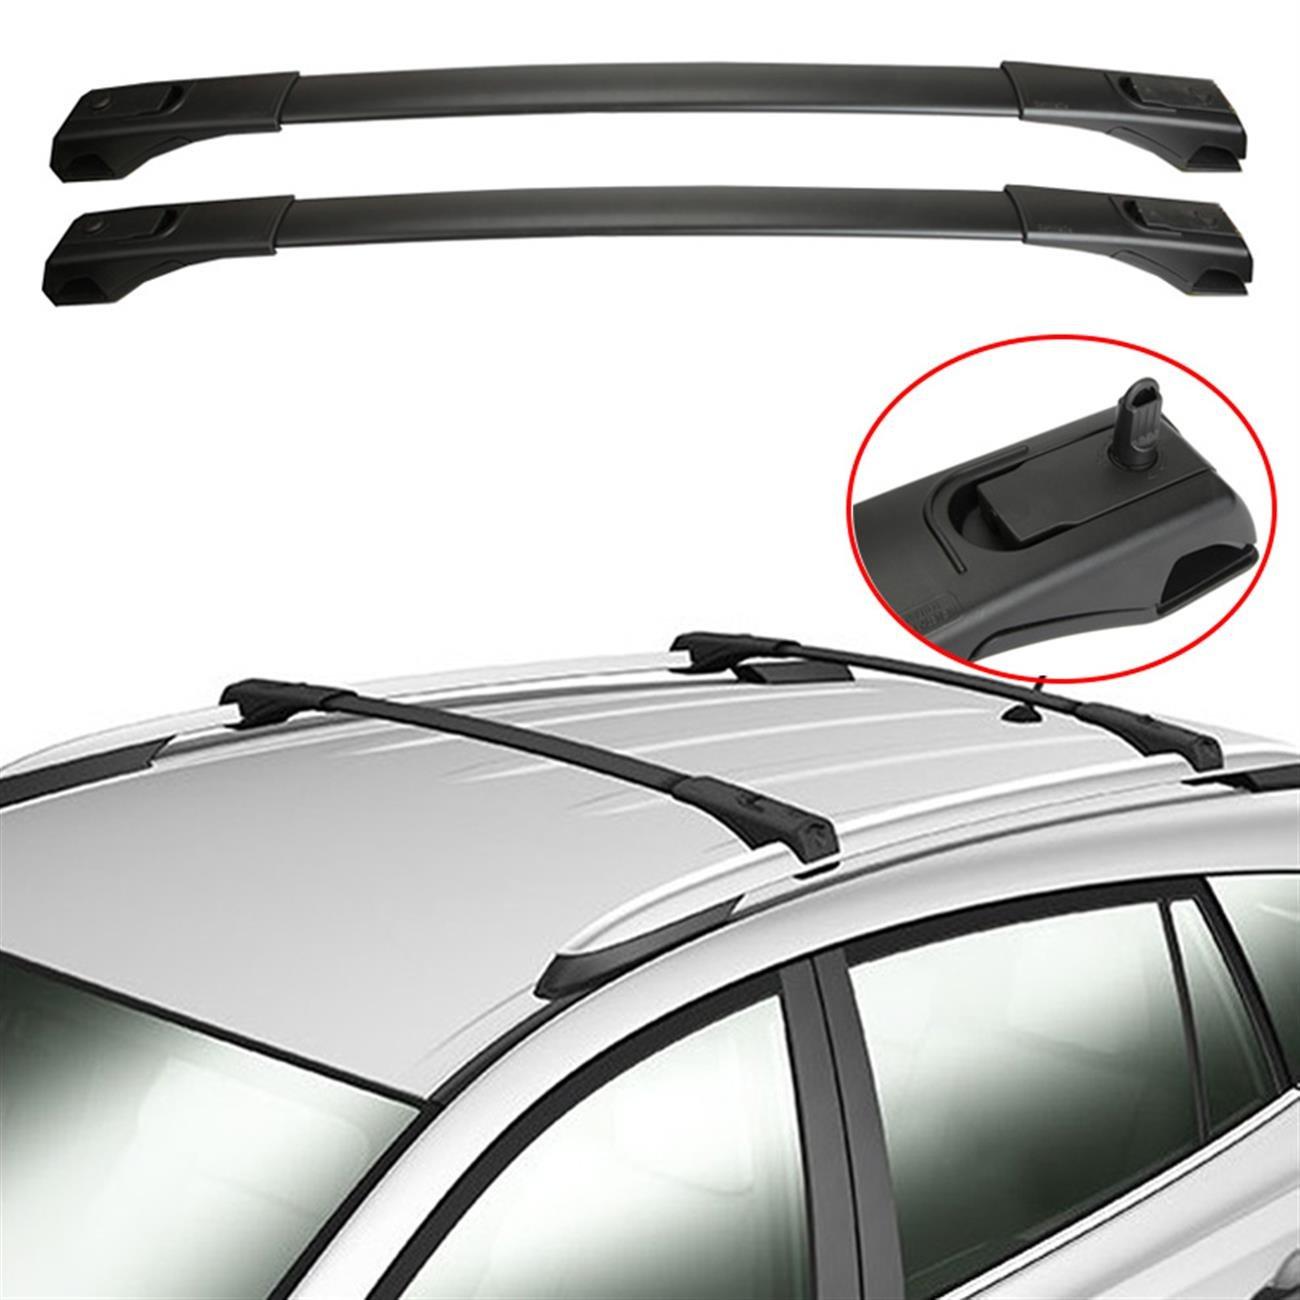 Toyota RAV4 Service Manual: Roof rack